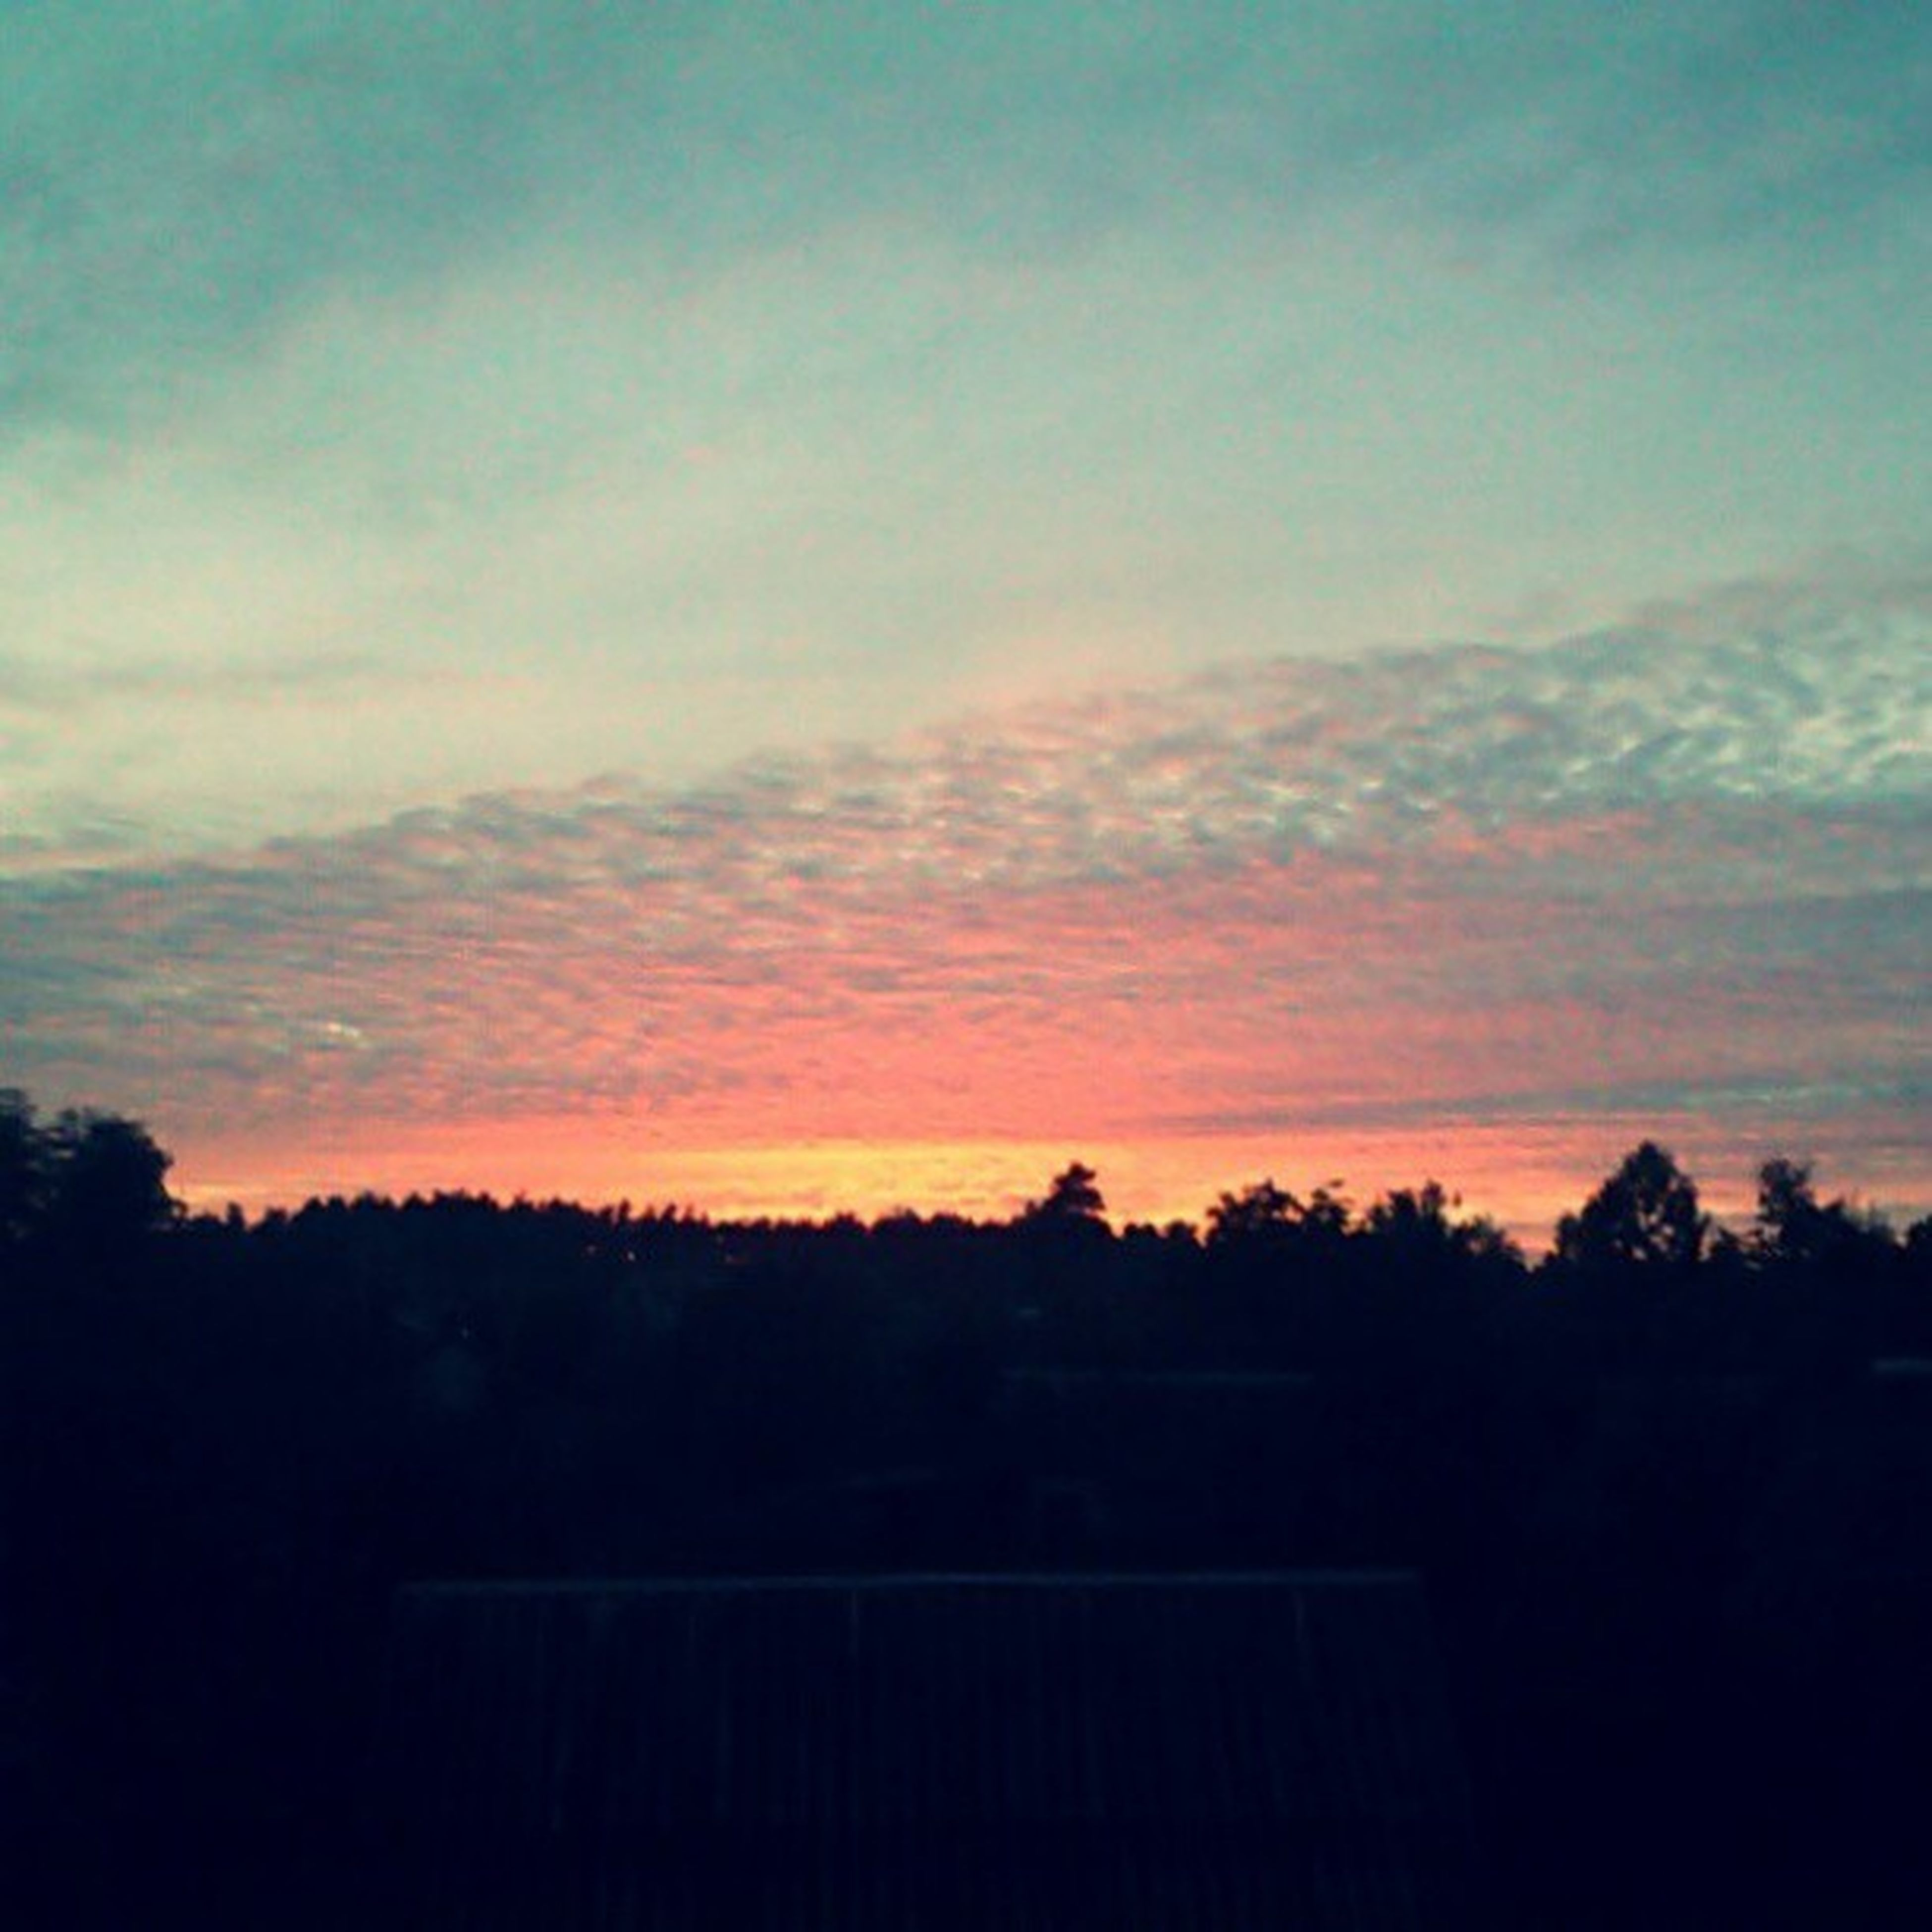 silhouette, sunset, tree, tranquil scene, tranquility, scenics, sky, beauty in nature, landscape, nature, idyllic, orange color, cloud - sky, dark, copy space, dusk, cloud, non-urban scene, outdoors, outline